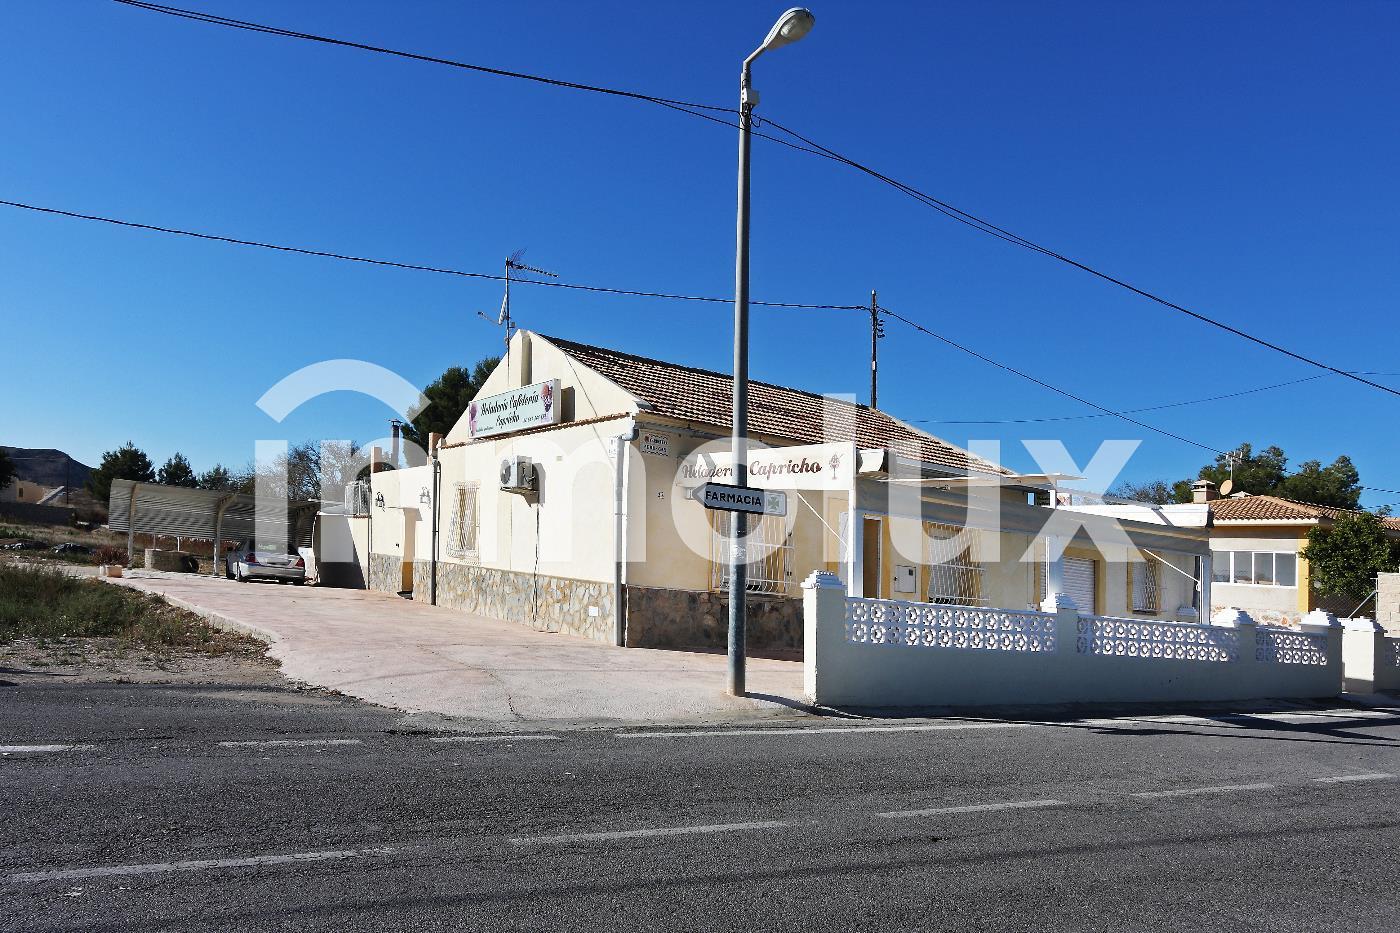 Chalet  en Sant Vicent del Raspeig Norte -  - >  €